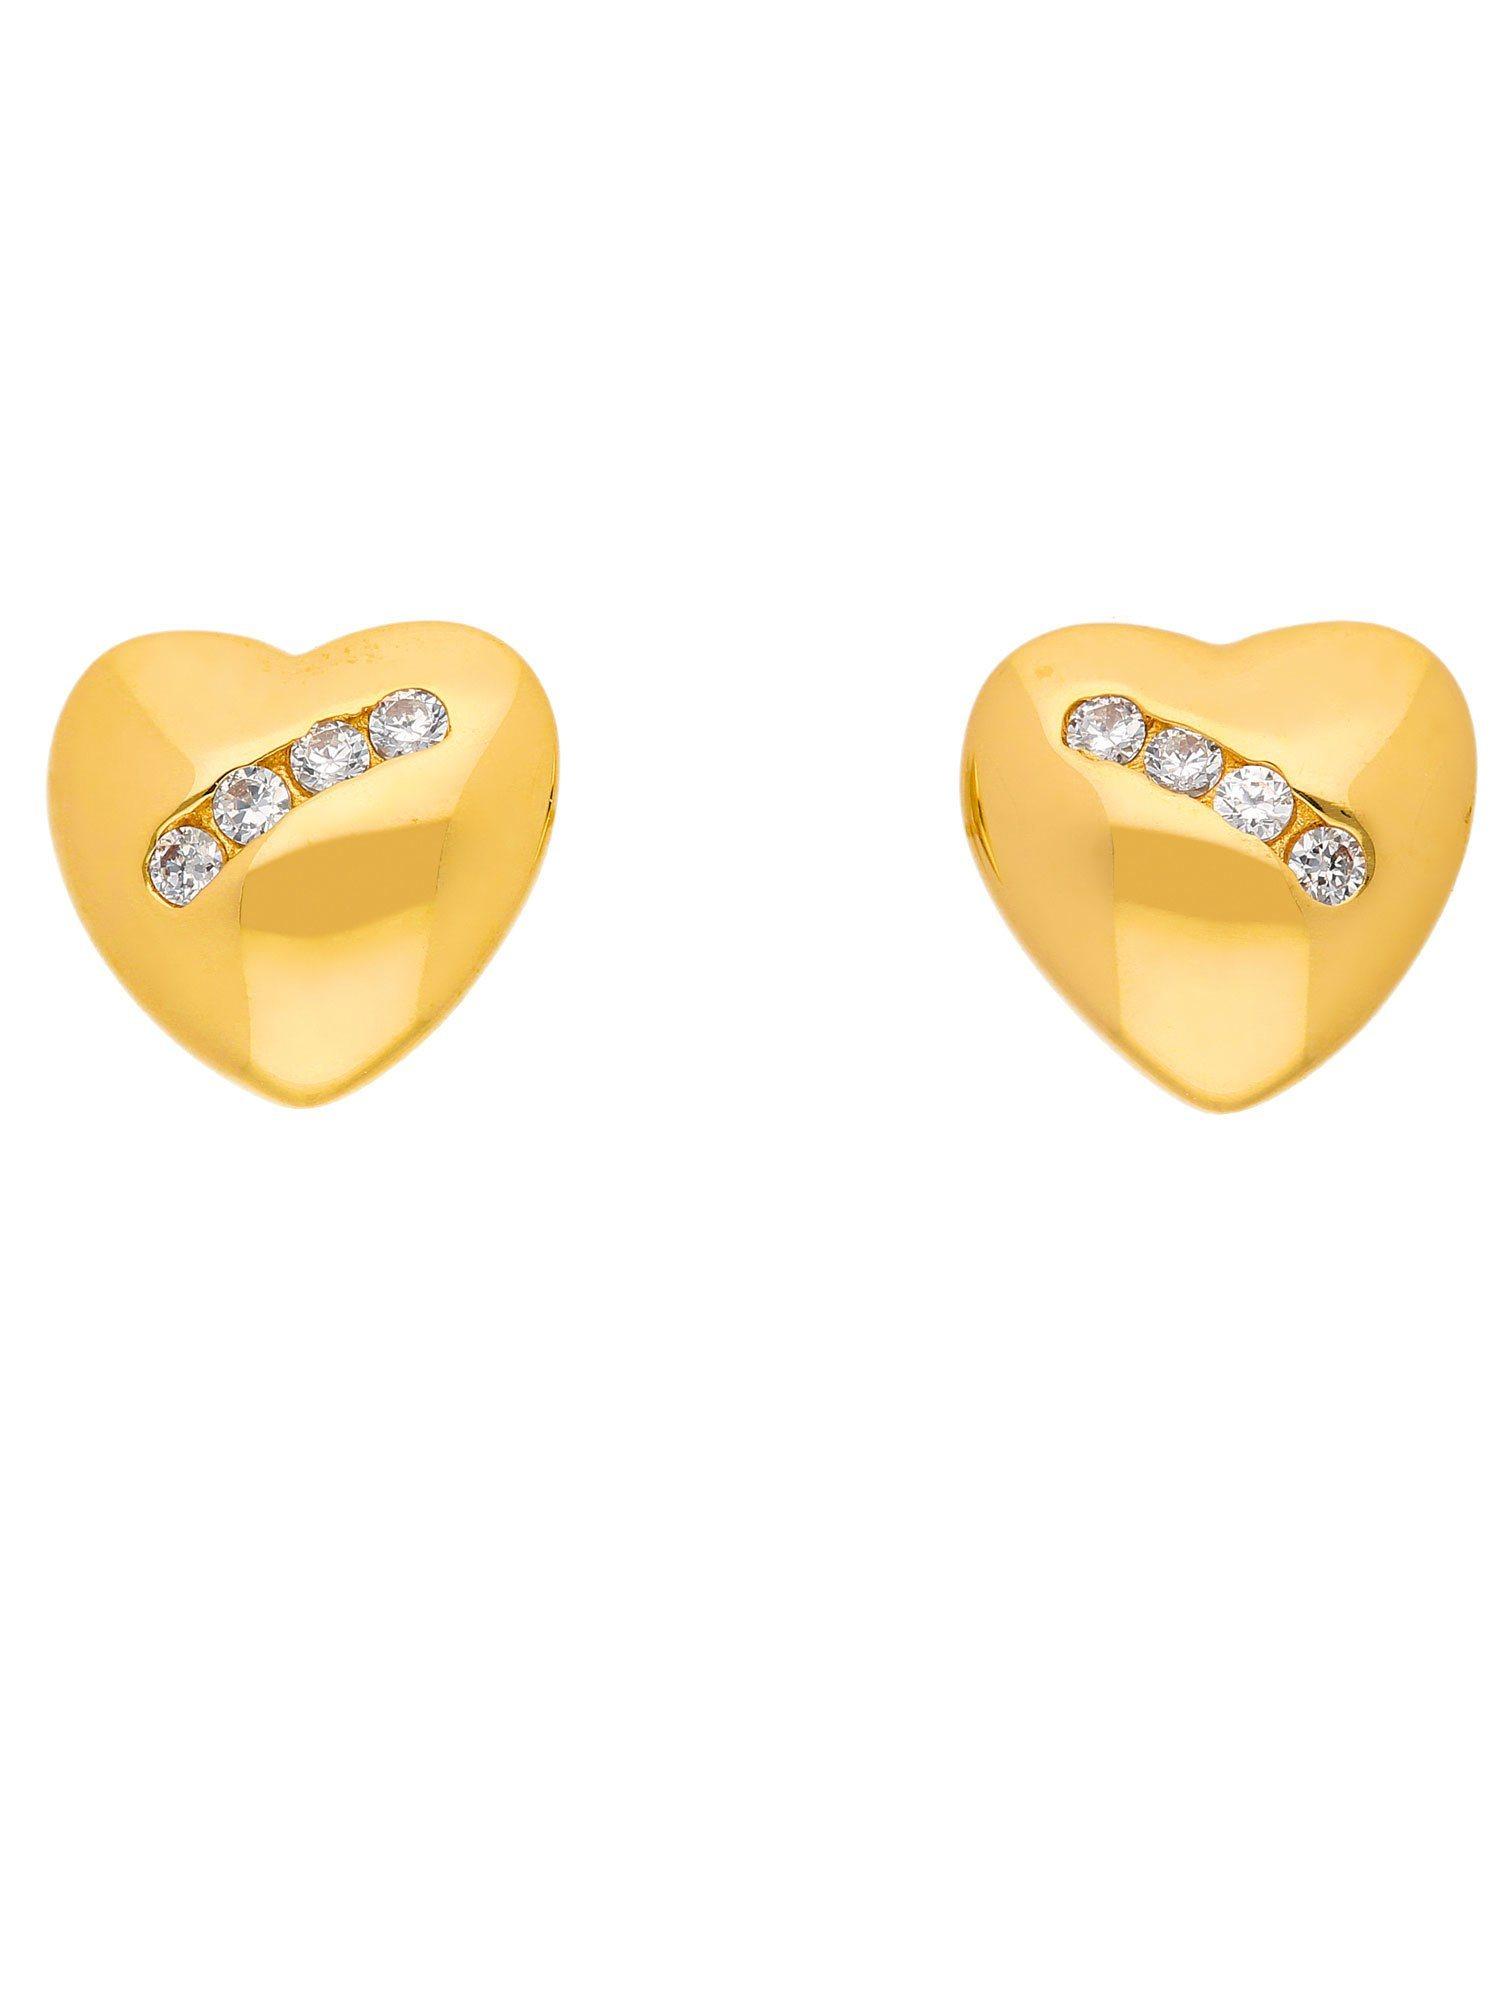 Adelia´s Paar Ohrstecker »Gold Ohrringe«, Herz 8 k 333 Gelbgold mit Zirkonia | Schmuck > Ohrschmuck & Ohrringe > Ohrstecker | Adelia´s